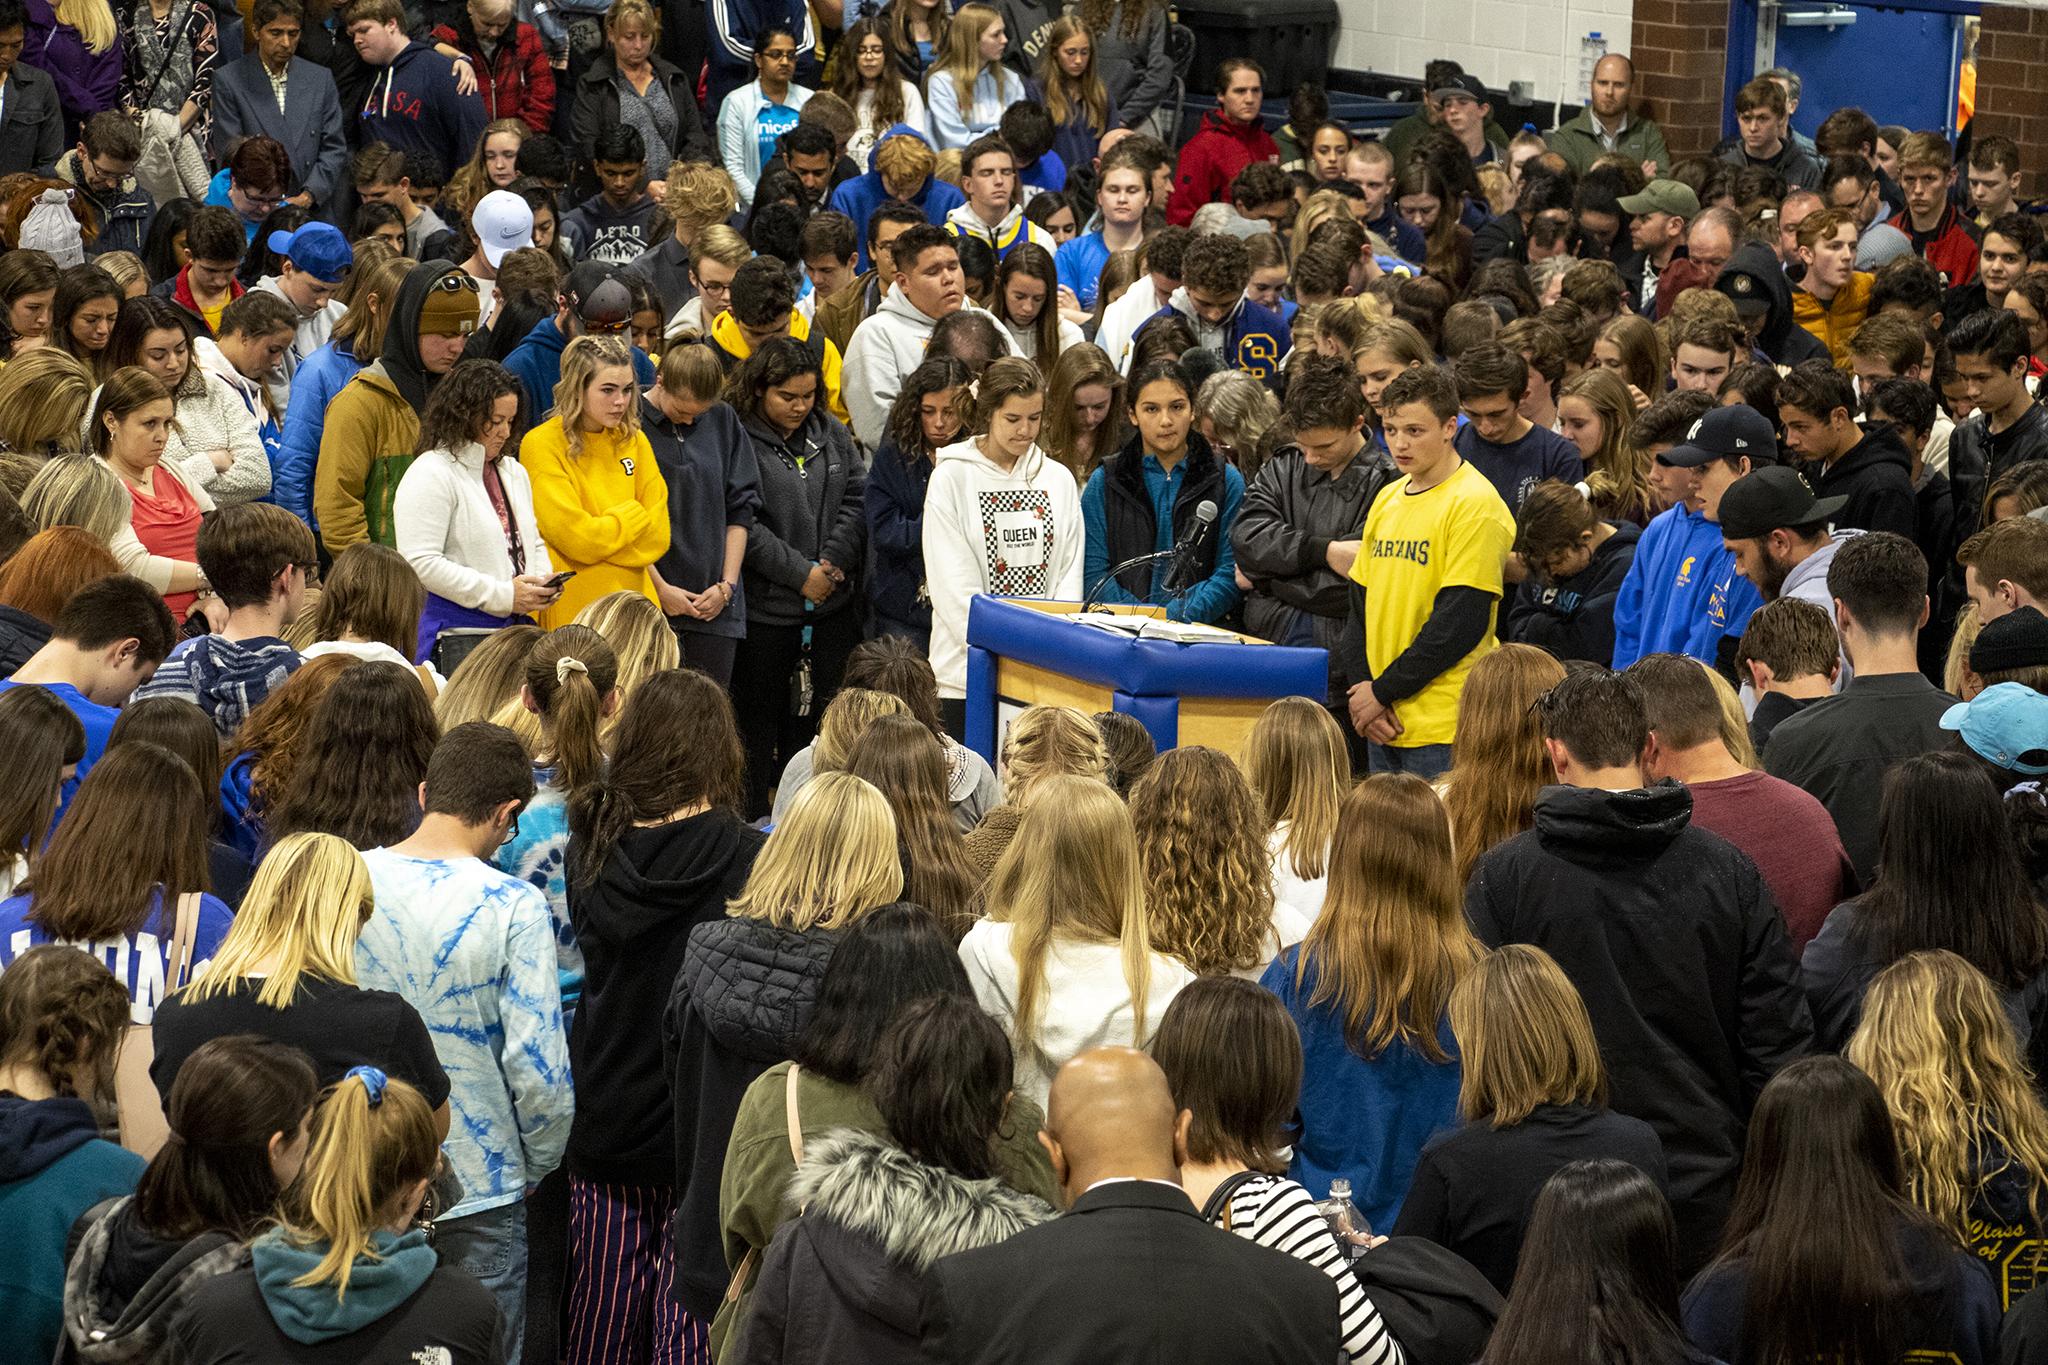 Photo: STEM School Highlands Ranch shooting vigil - students at mic